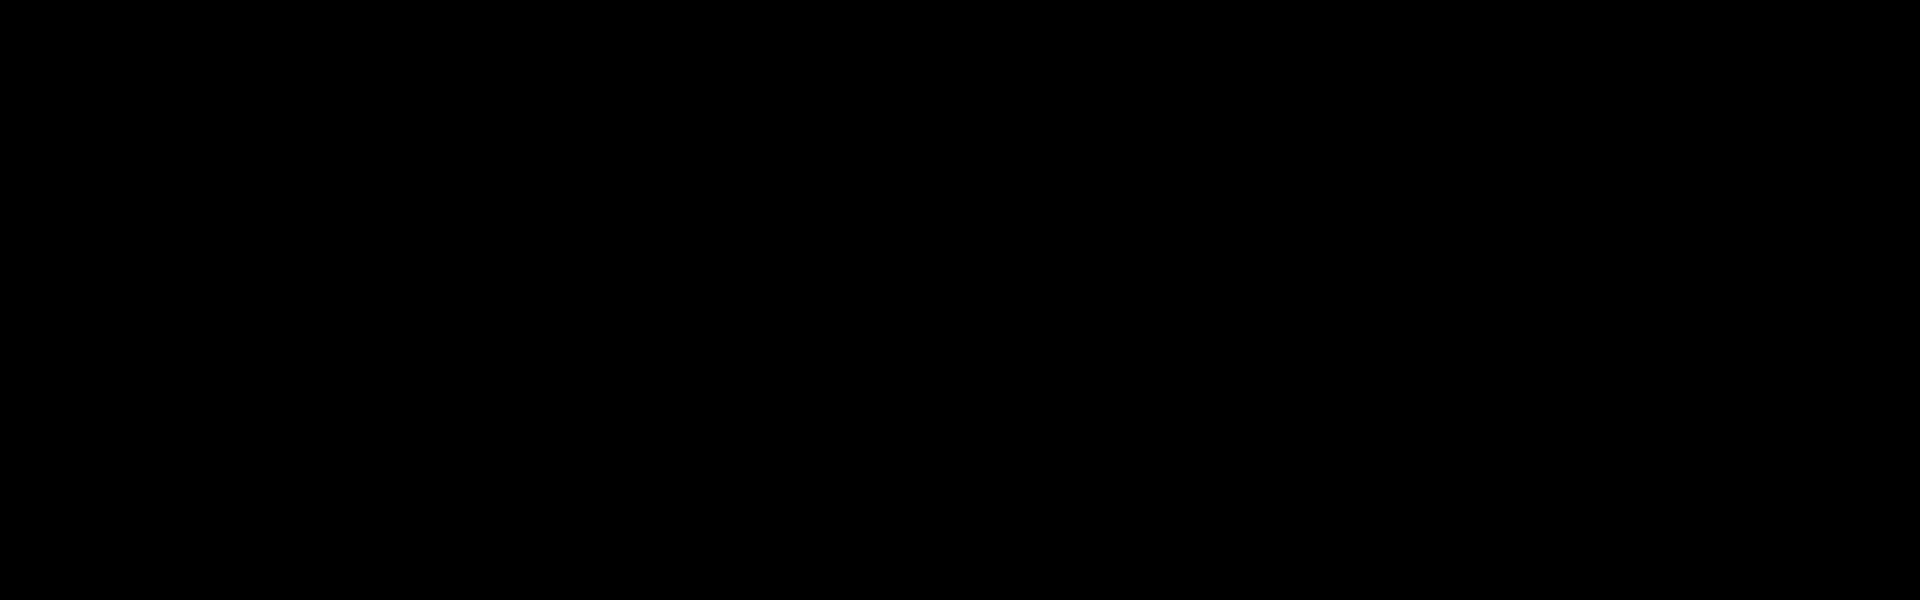 Neliza K Collective Logo_Black